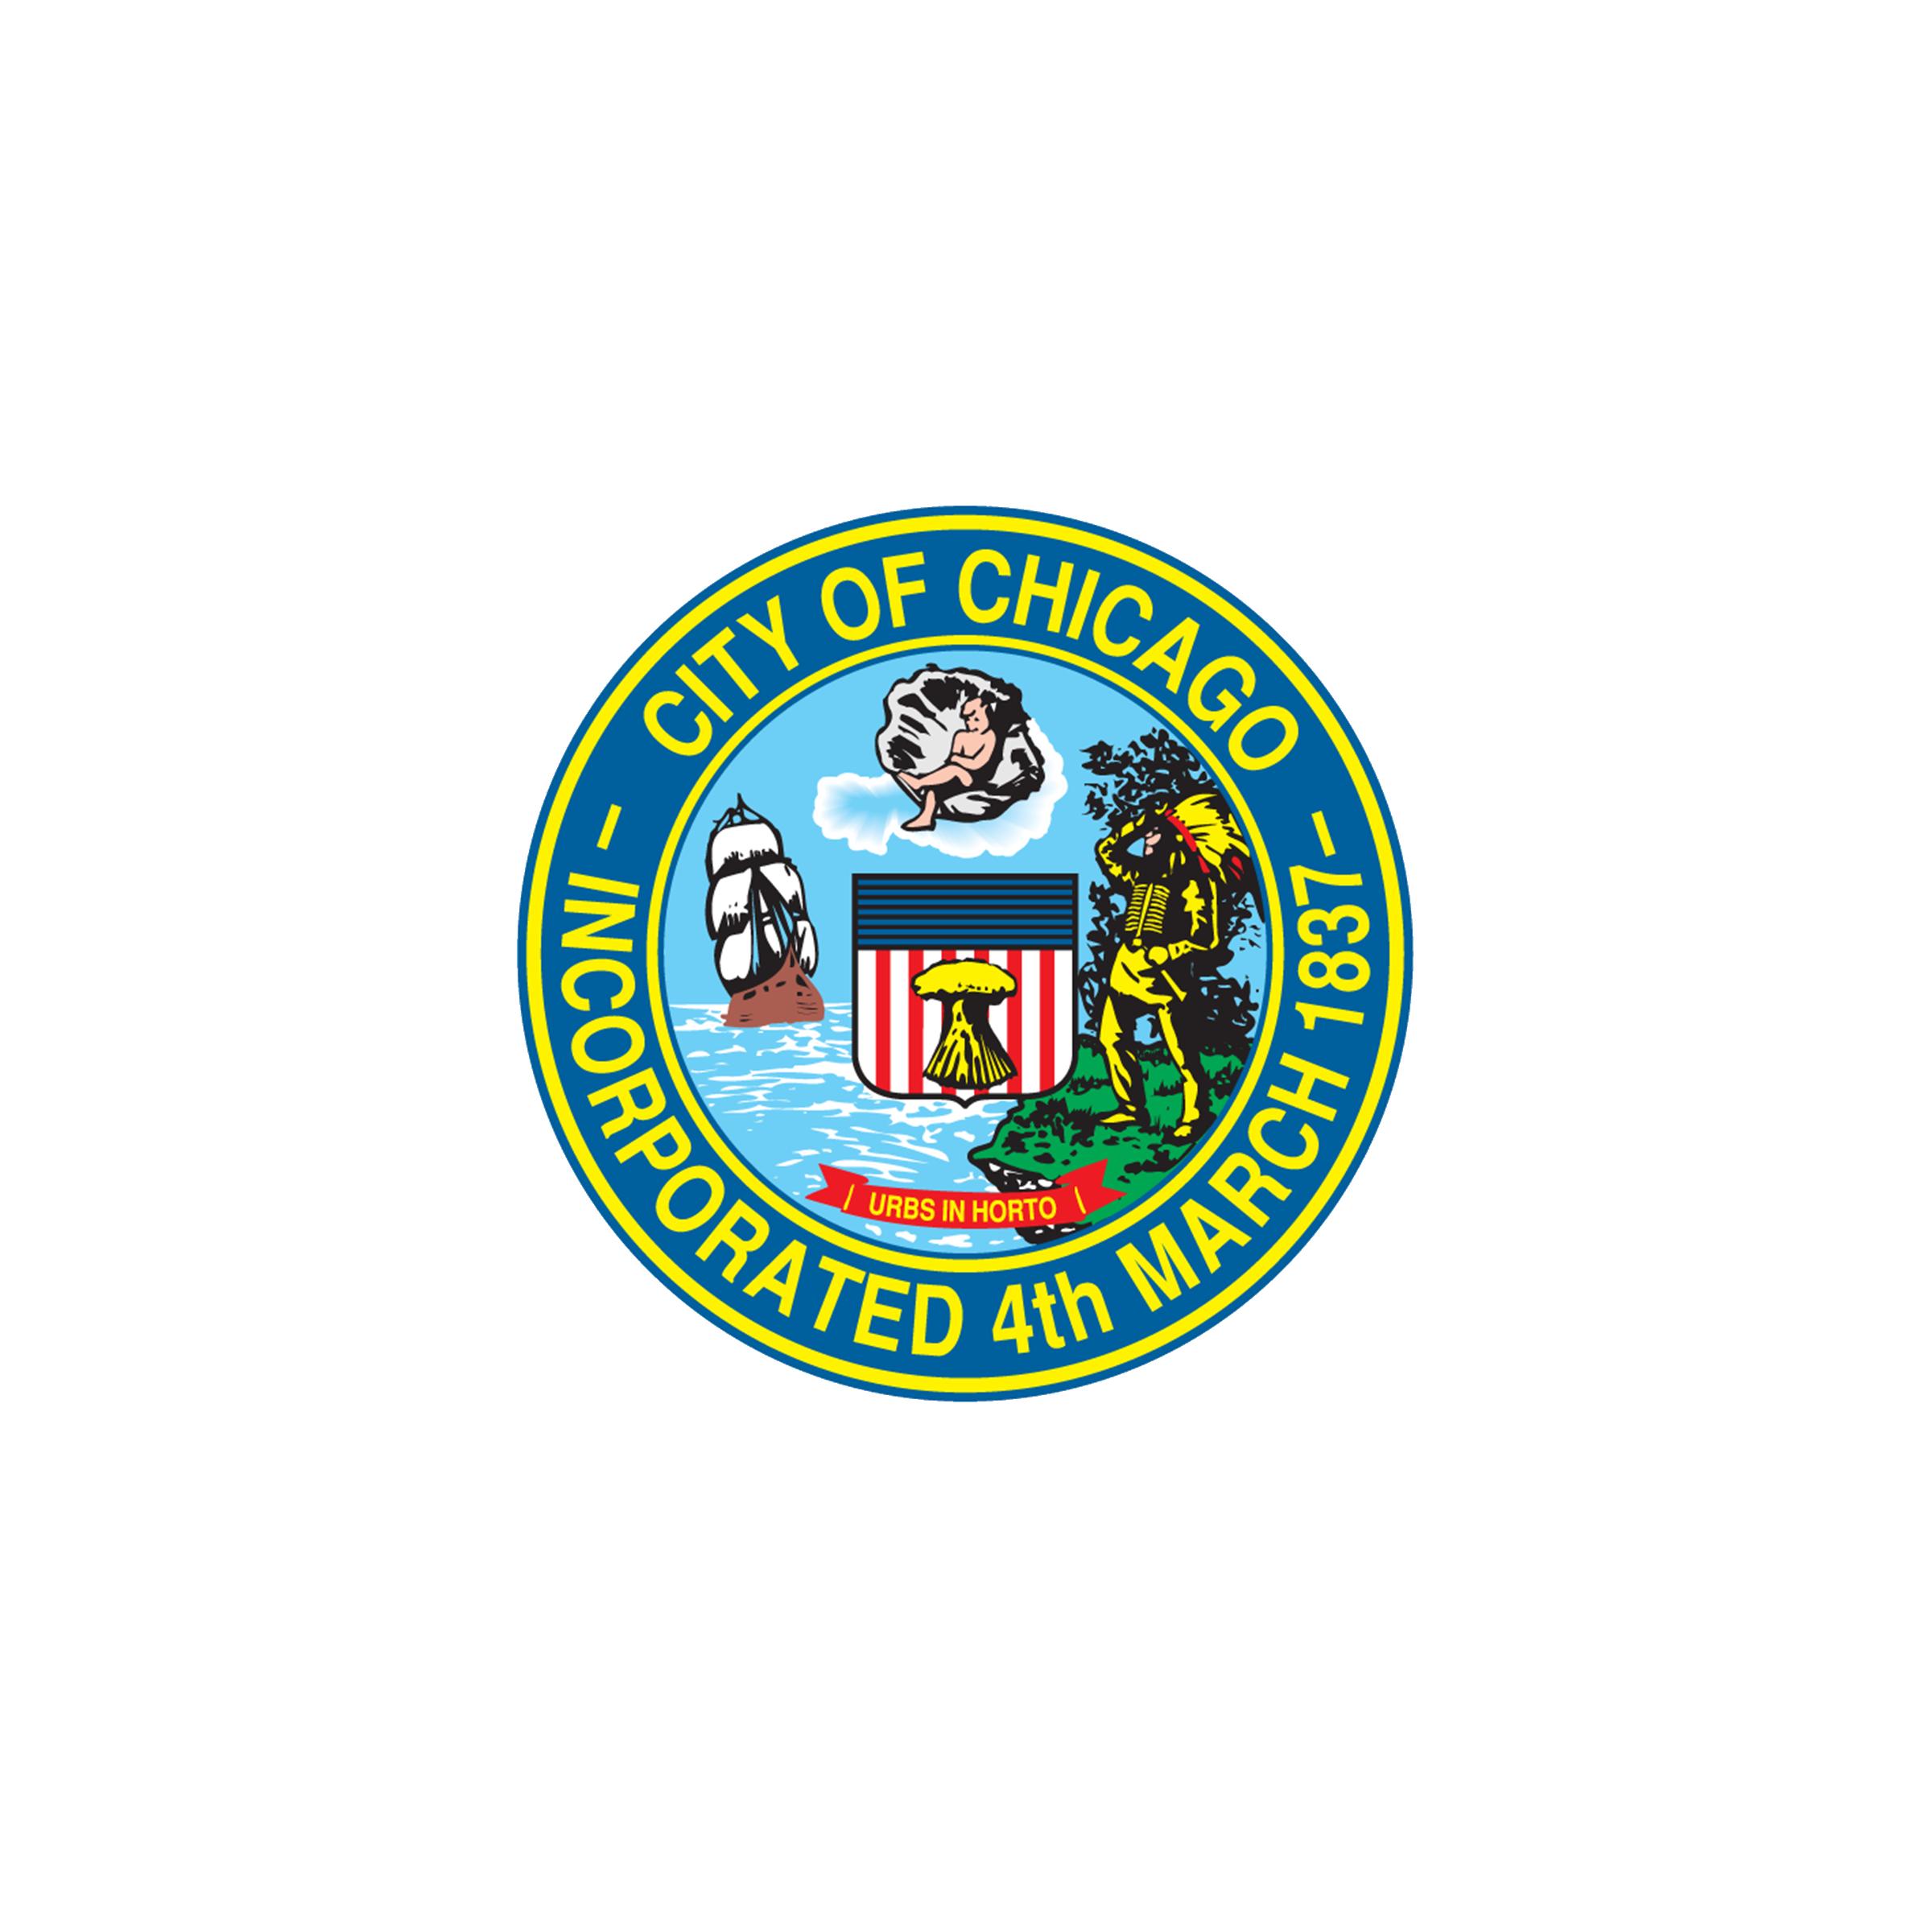 CityofChicago.png